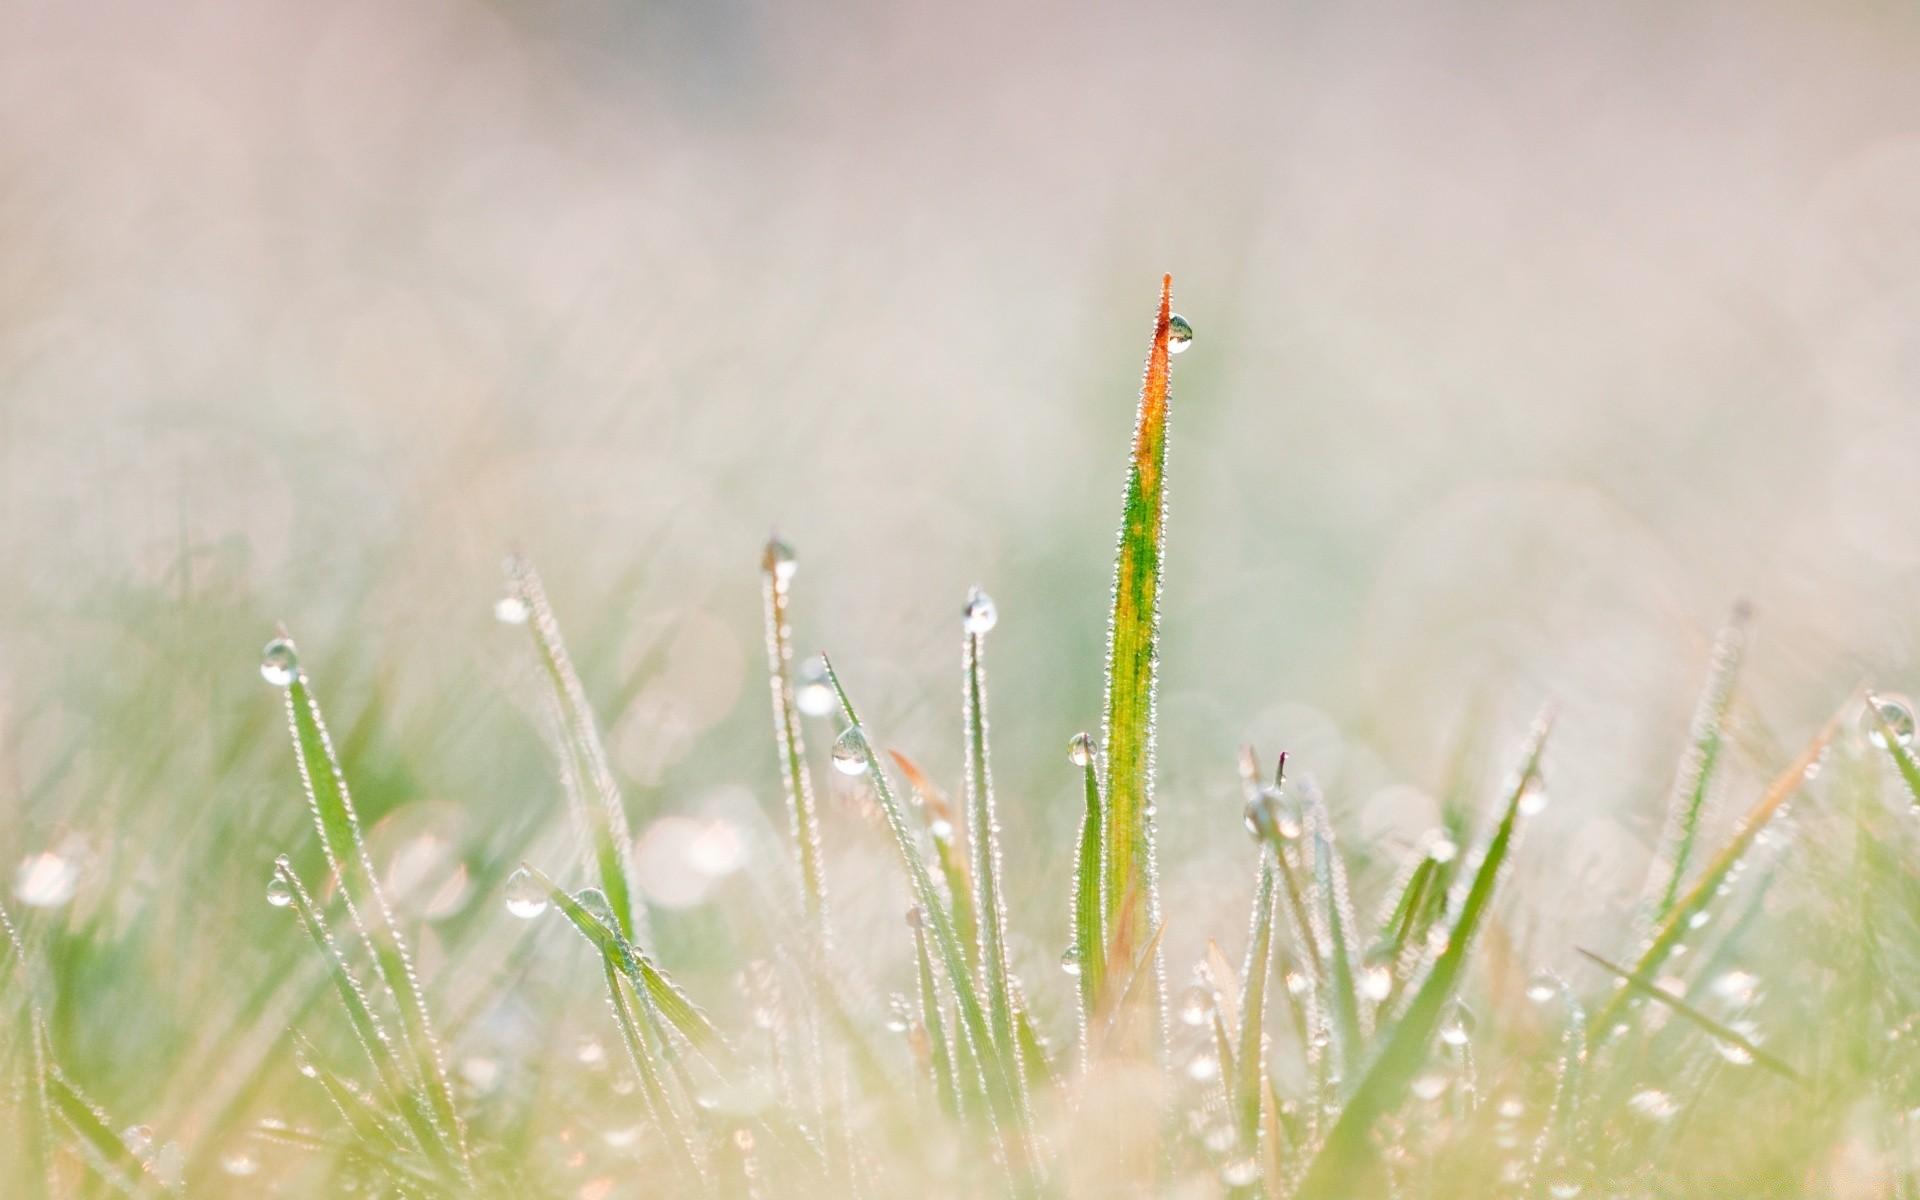 Трава макро съемка  № 3147989 загрузить